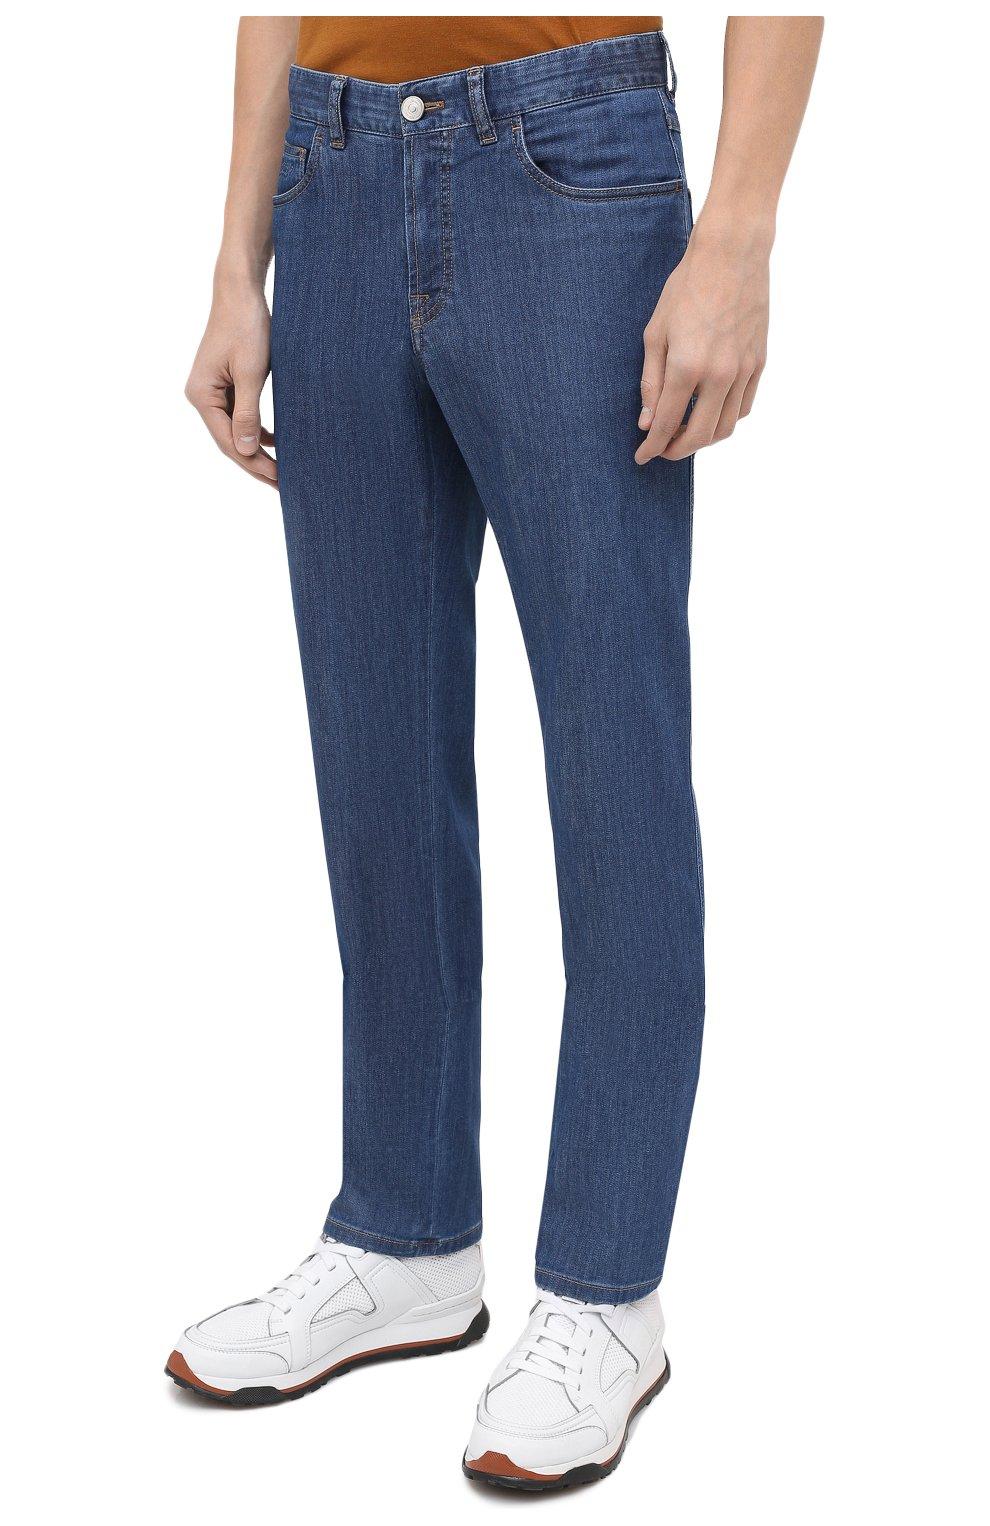 Мужские джинсы BRIONI голубого цвета, арт. SPNJ0L/P9D22/STELVI0 | Фото 4